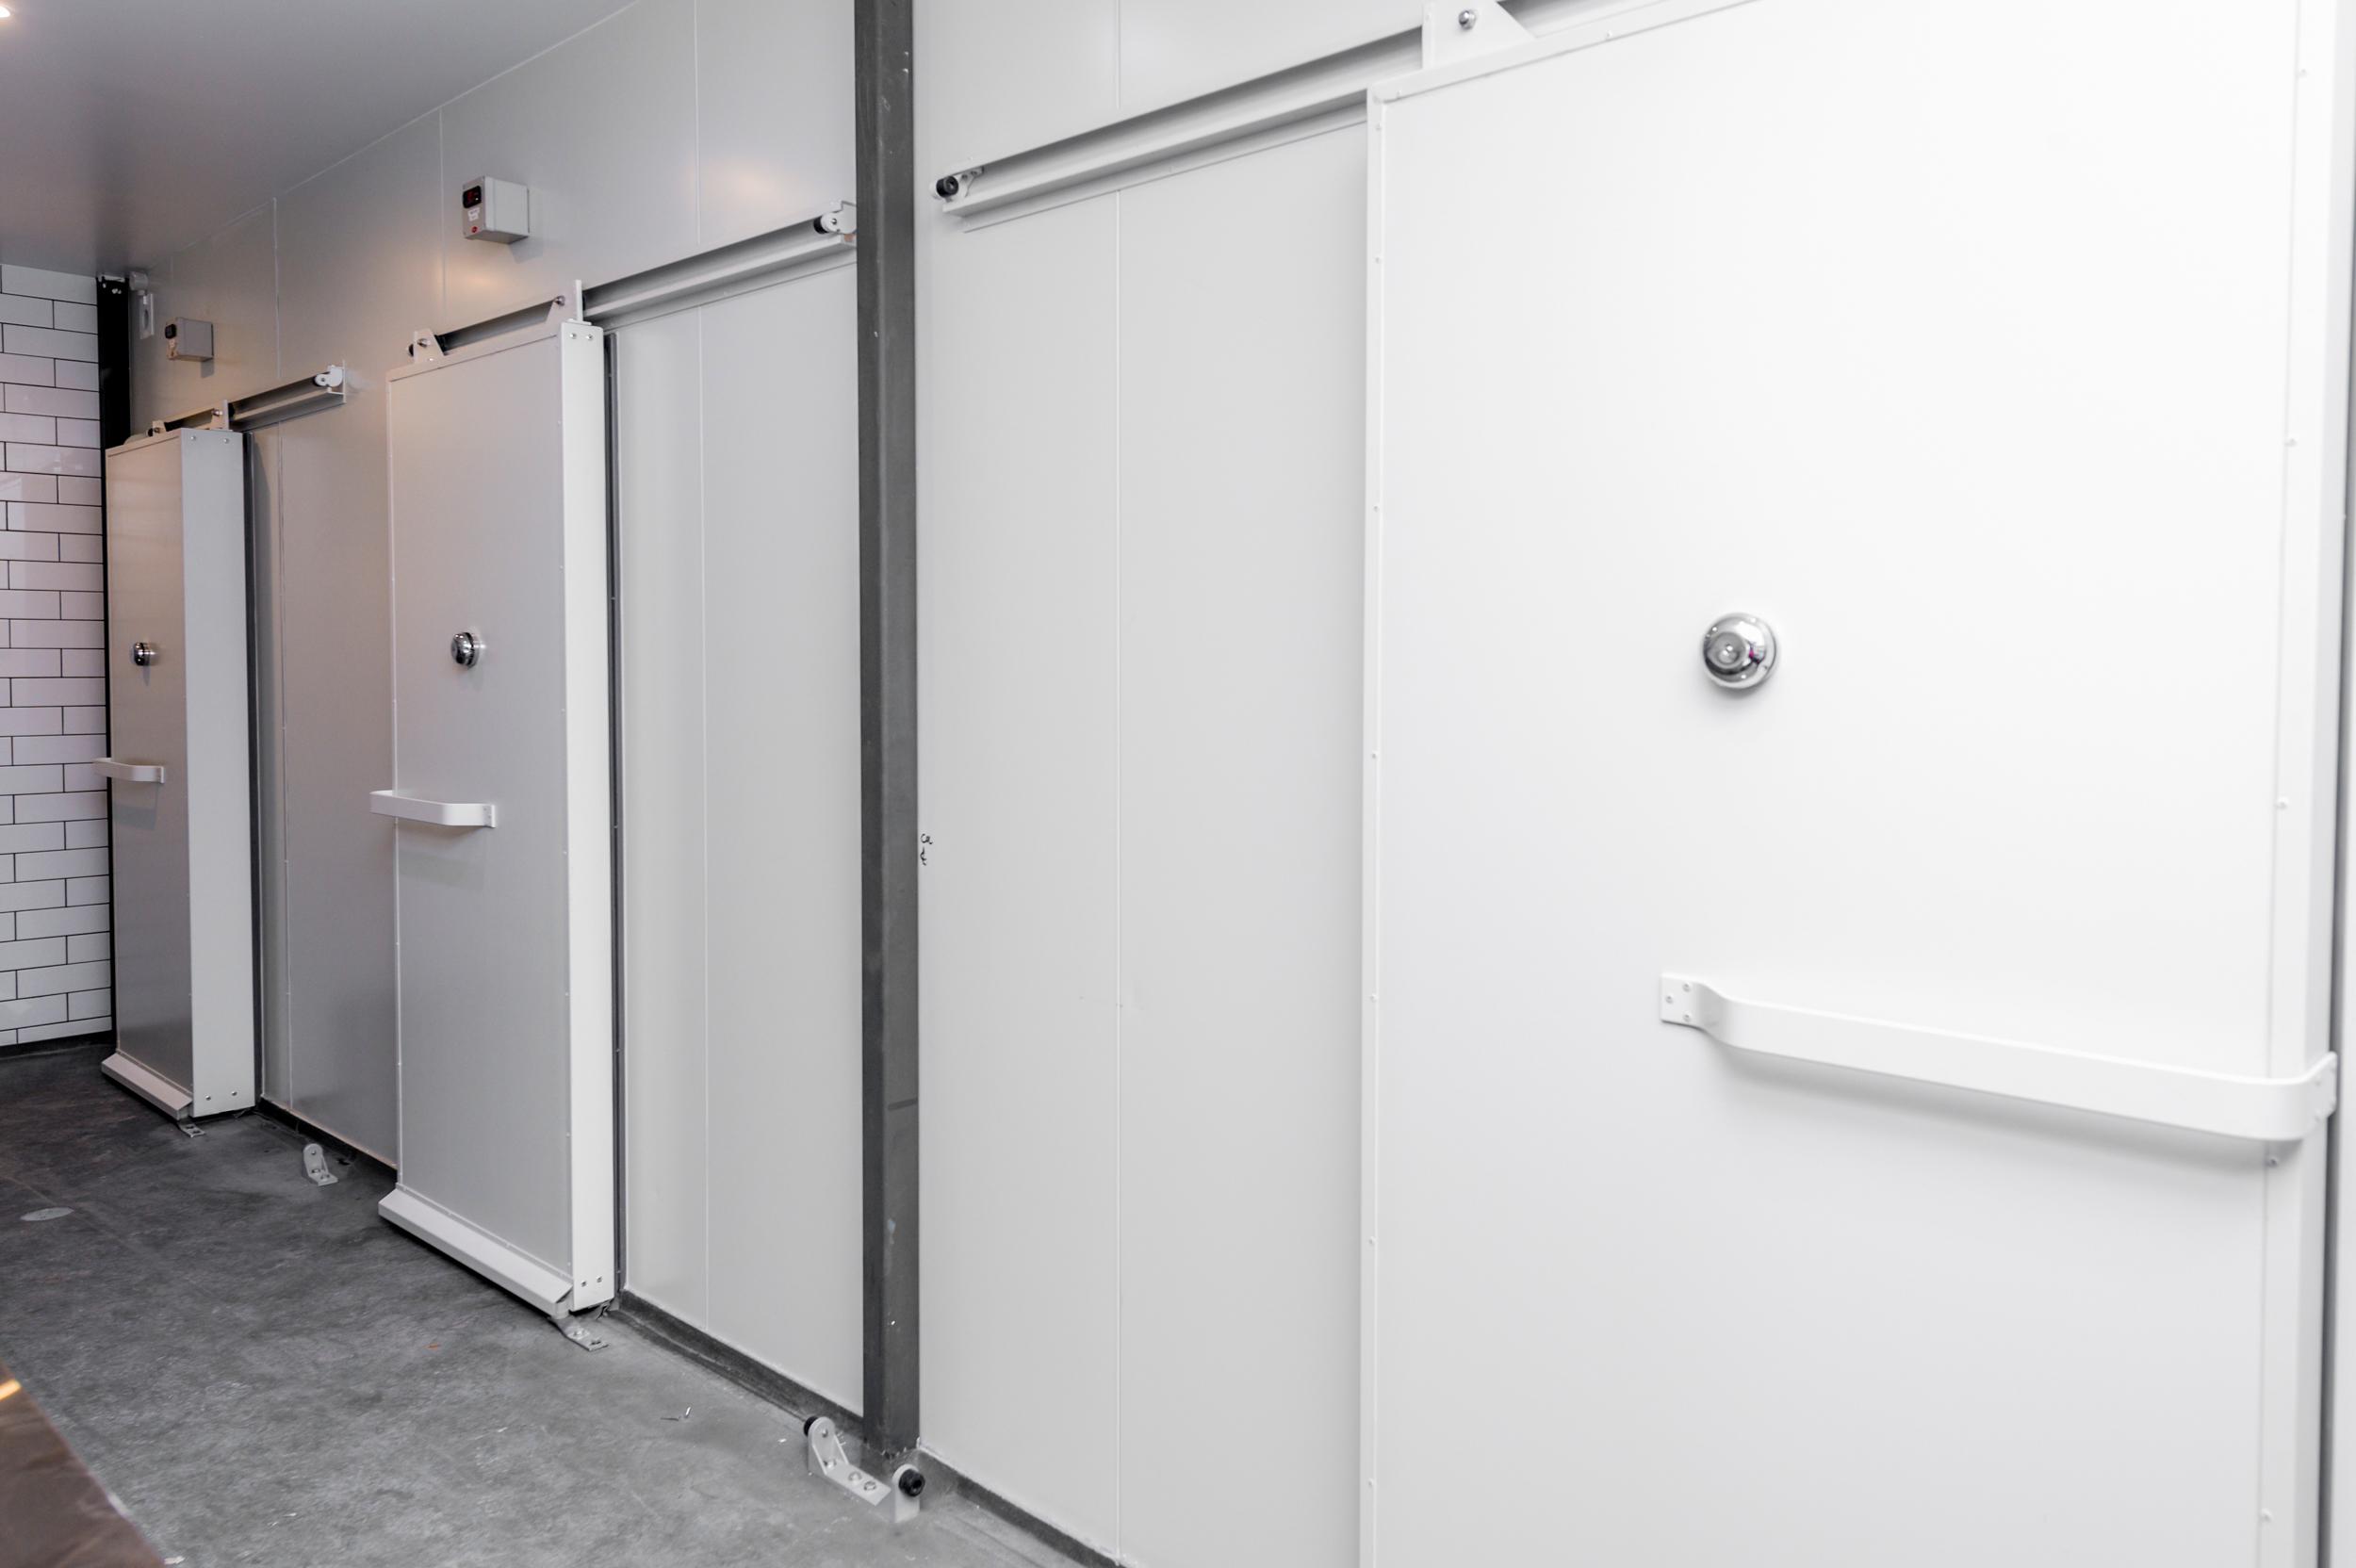 coolroom freezer service